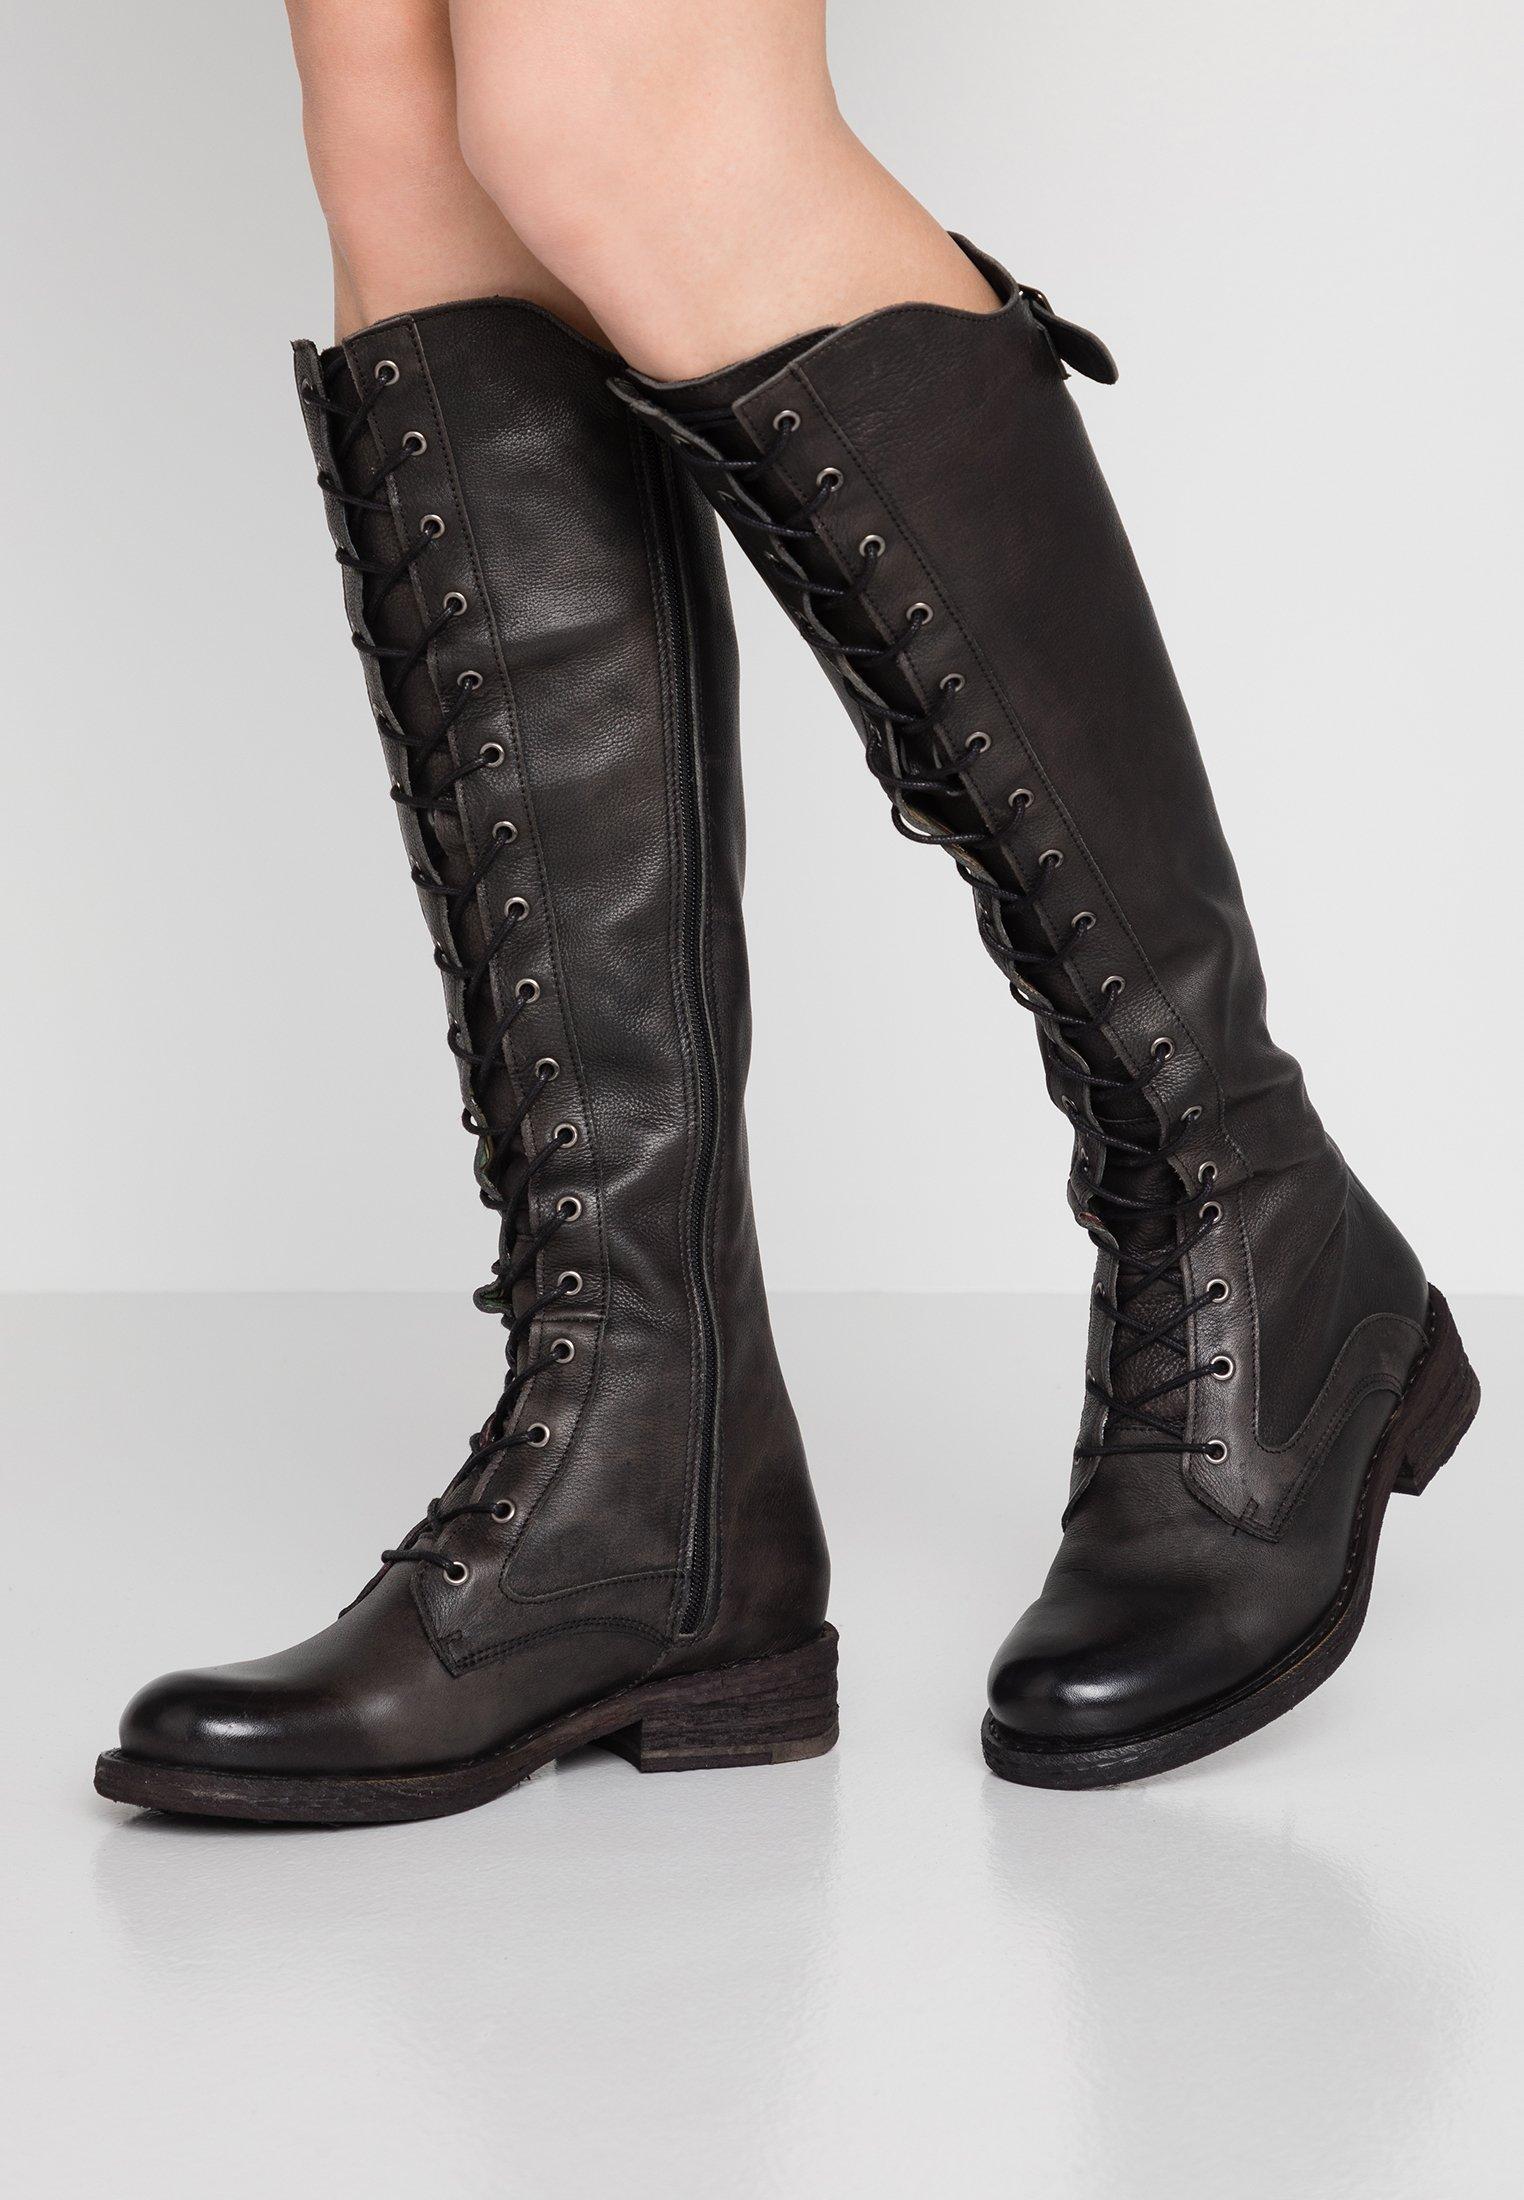 Women HARDY - Lace-up boots - targoff